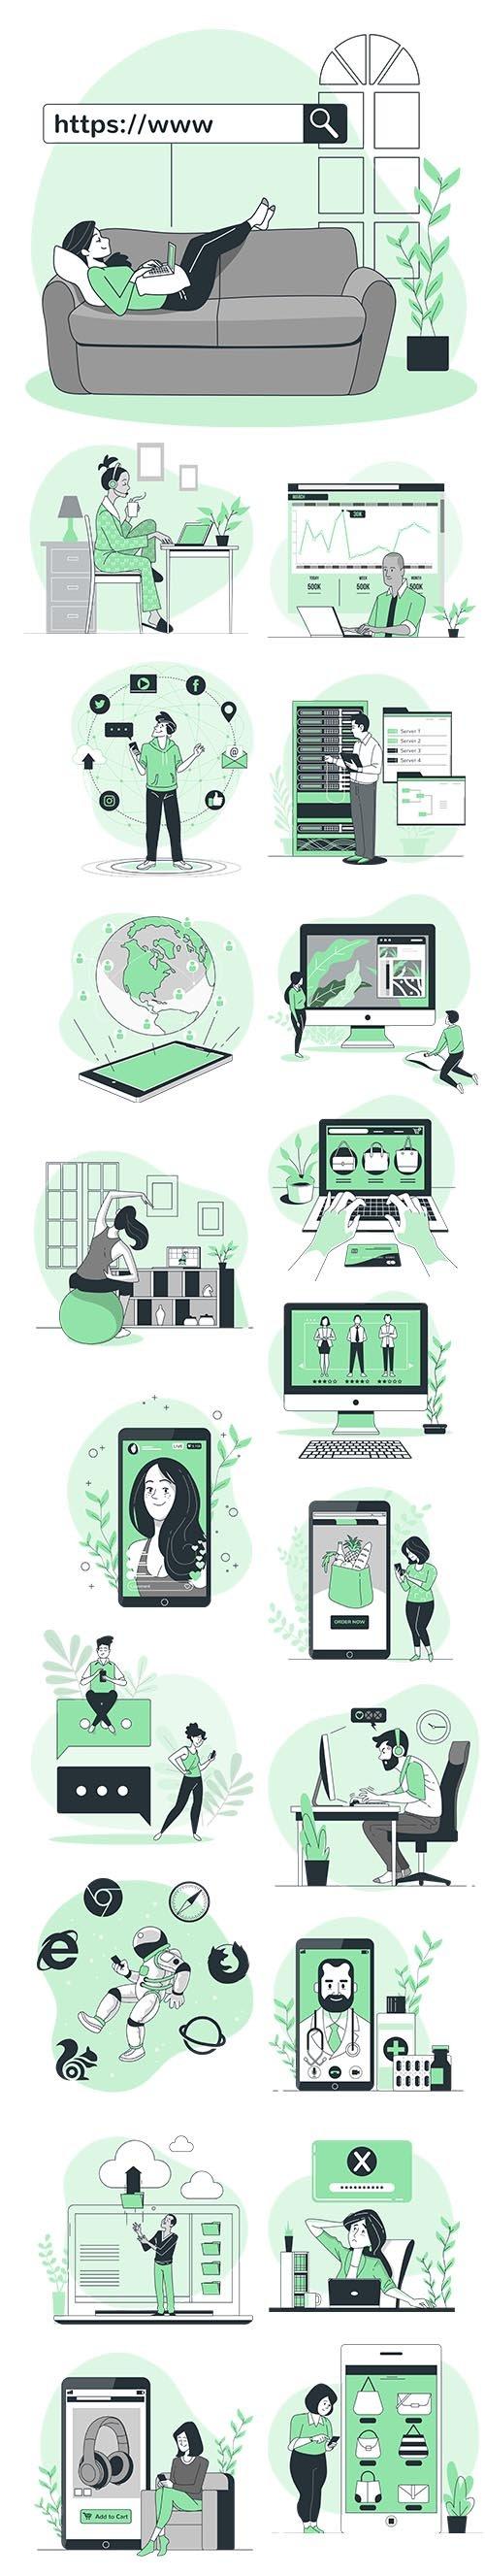 Vector Green Illustrations Online Concept